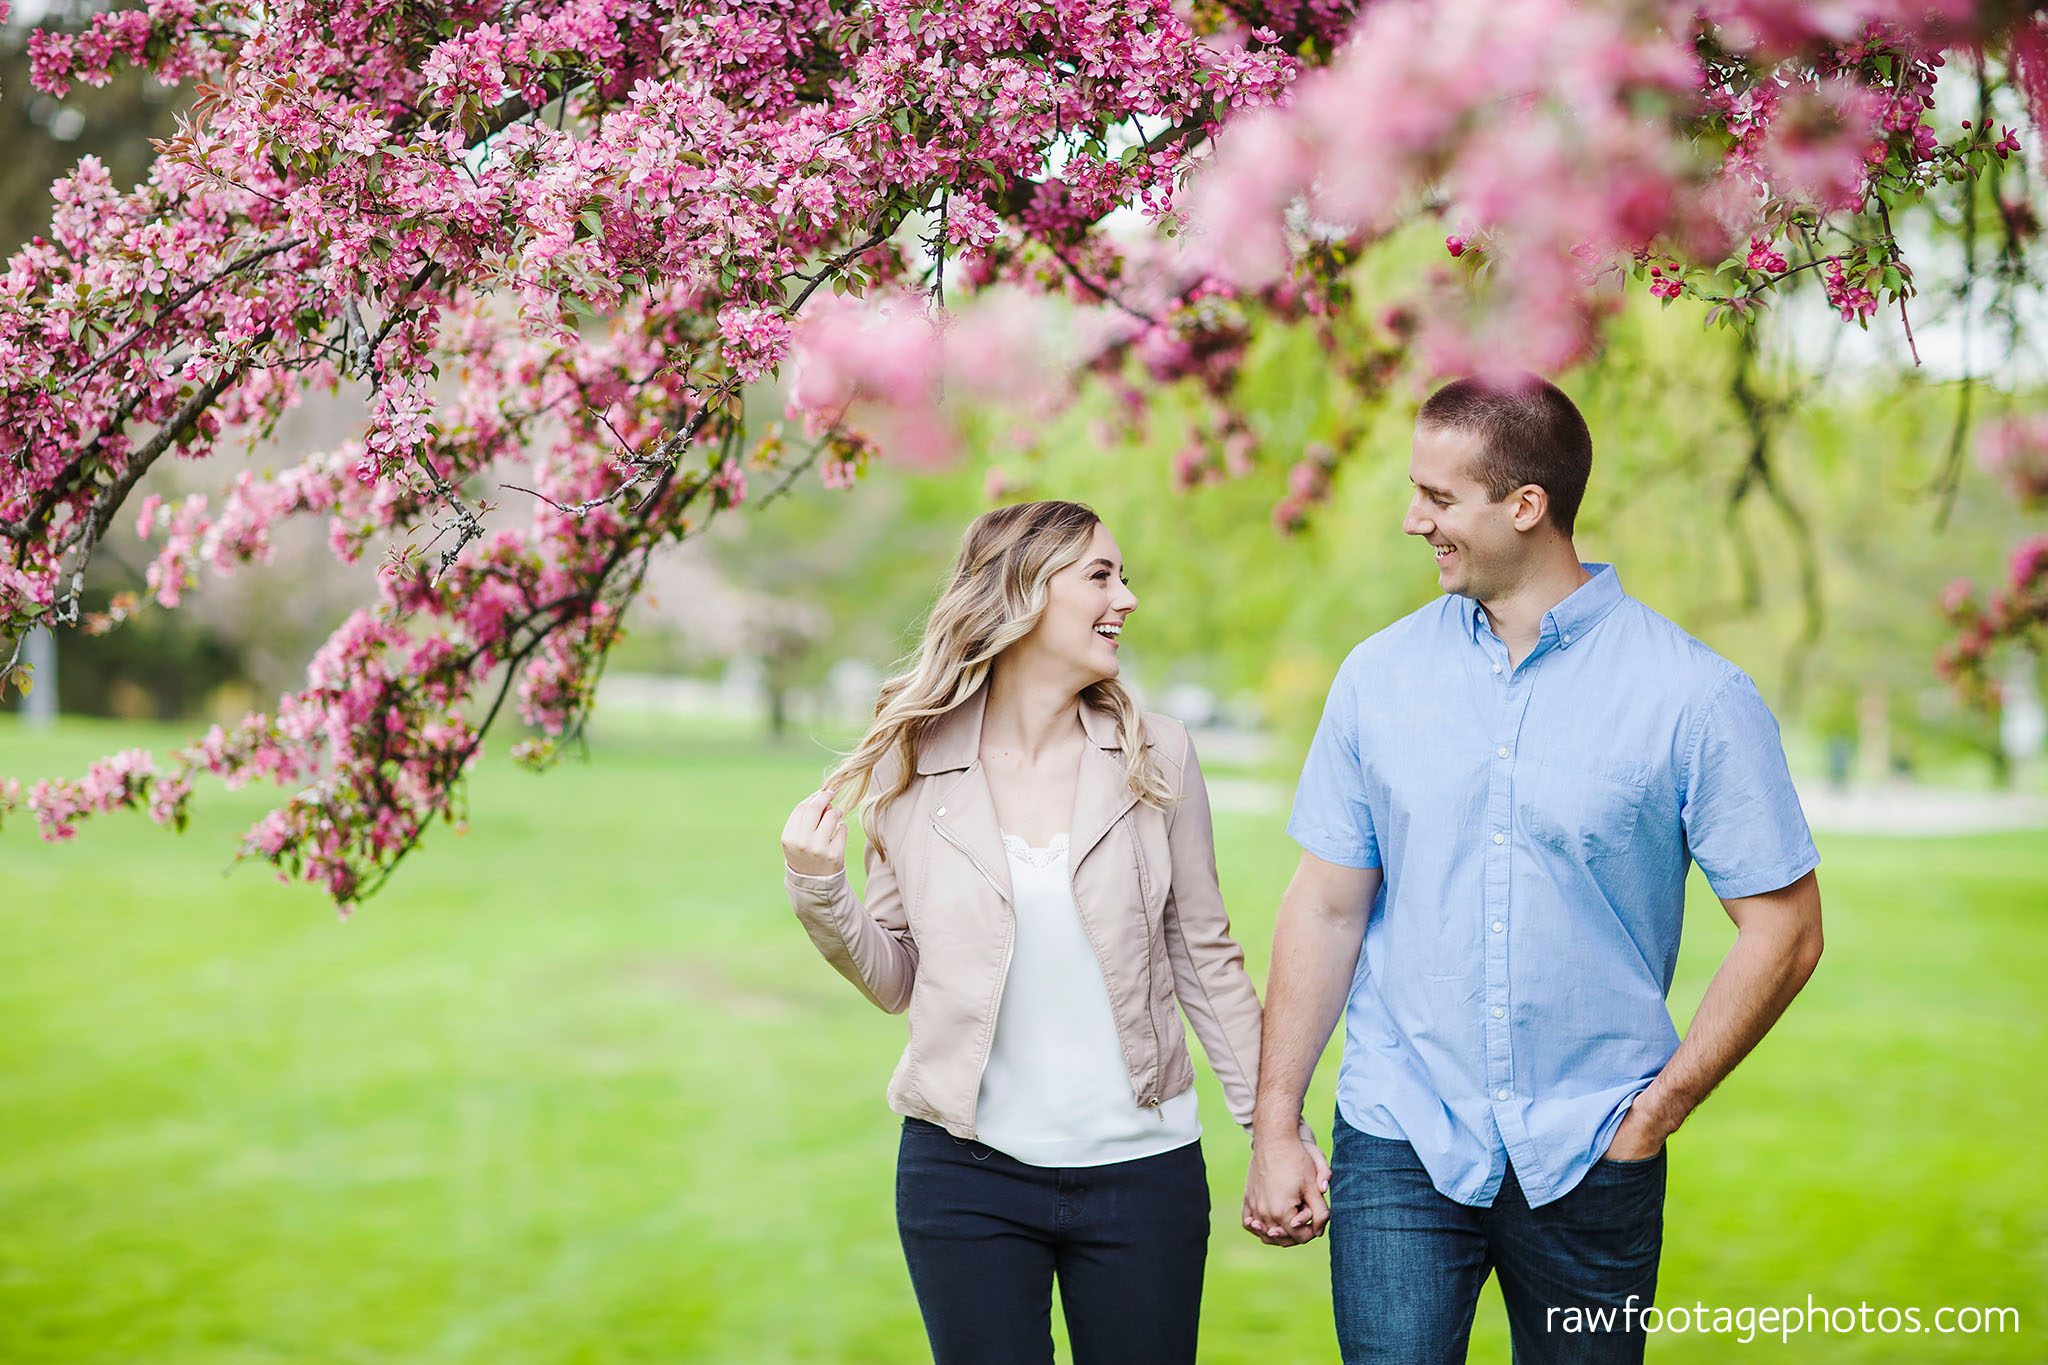 london_ontario_wedding_photographer-raw_footage_photography-engagement_session-engagement_photos-spring-blossoms-blooms004.jpg